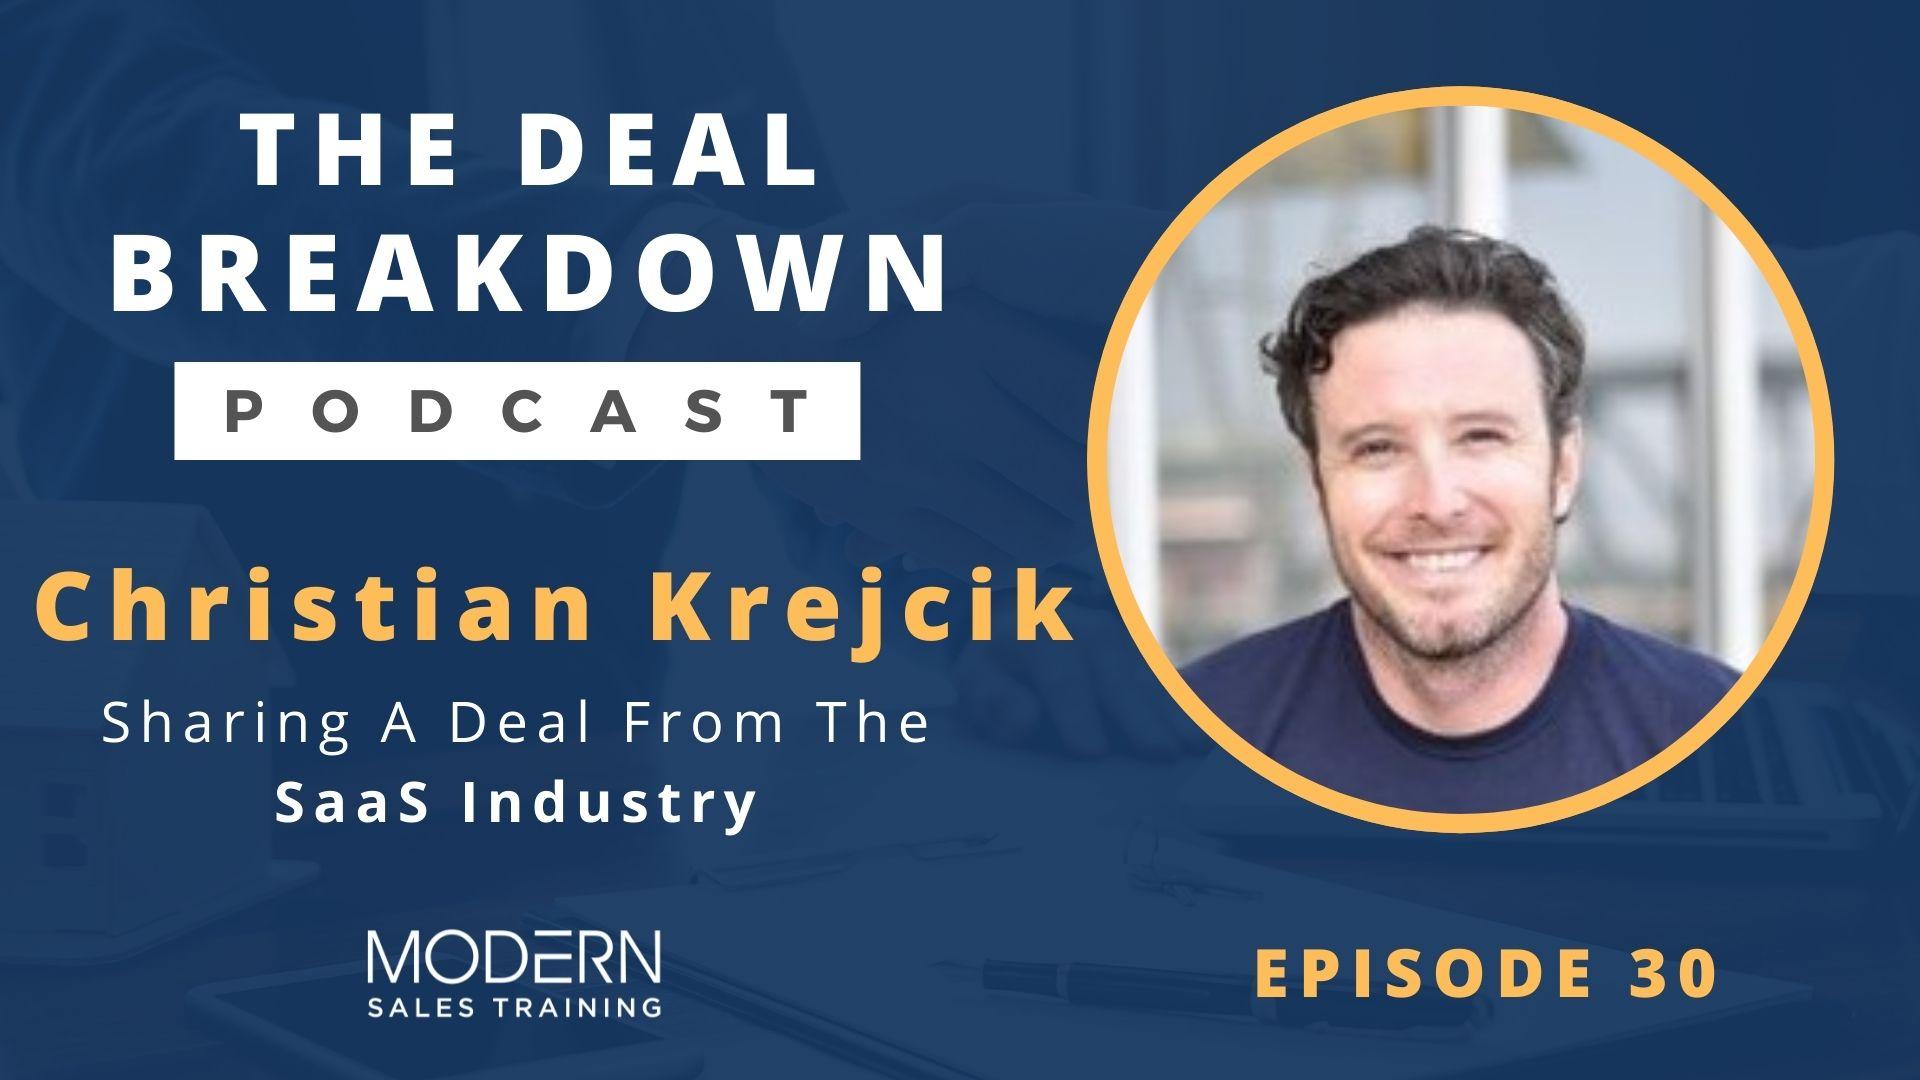 Christian-Krejcik-Deal-Breakdown-Podcast-Modern-Sales-Training